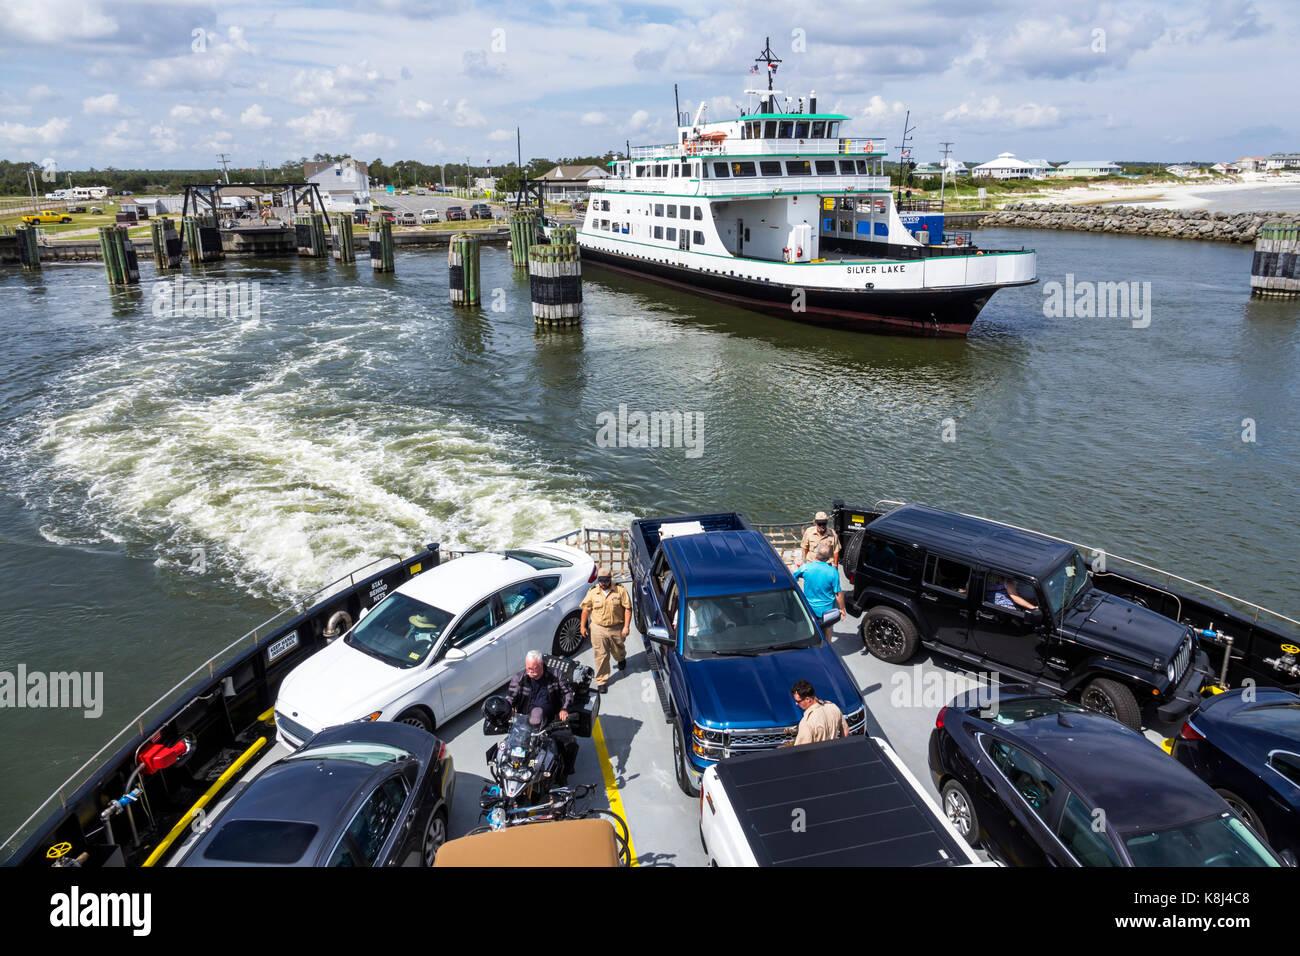 North Carolina NC Pamlico Sound Outer Banks Cedar Island Ocracoke ferry boat wake water vehicles - Stock Image